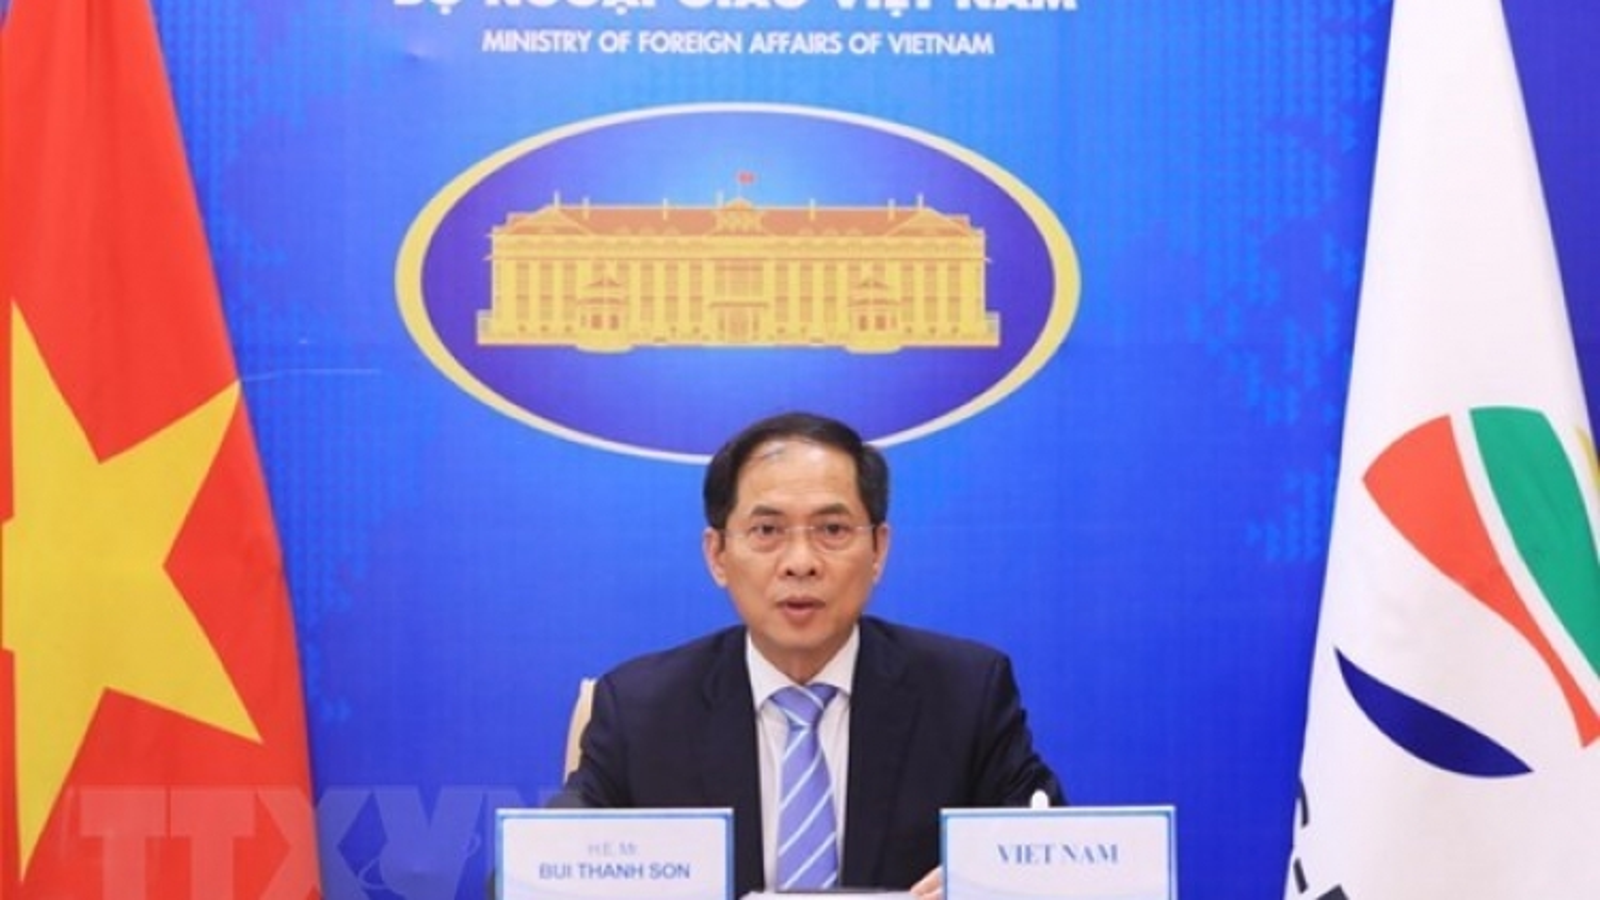 Vietnam attends 11th Mekong-RoK Foreign Ministers' Meeting